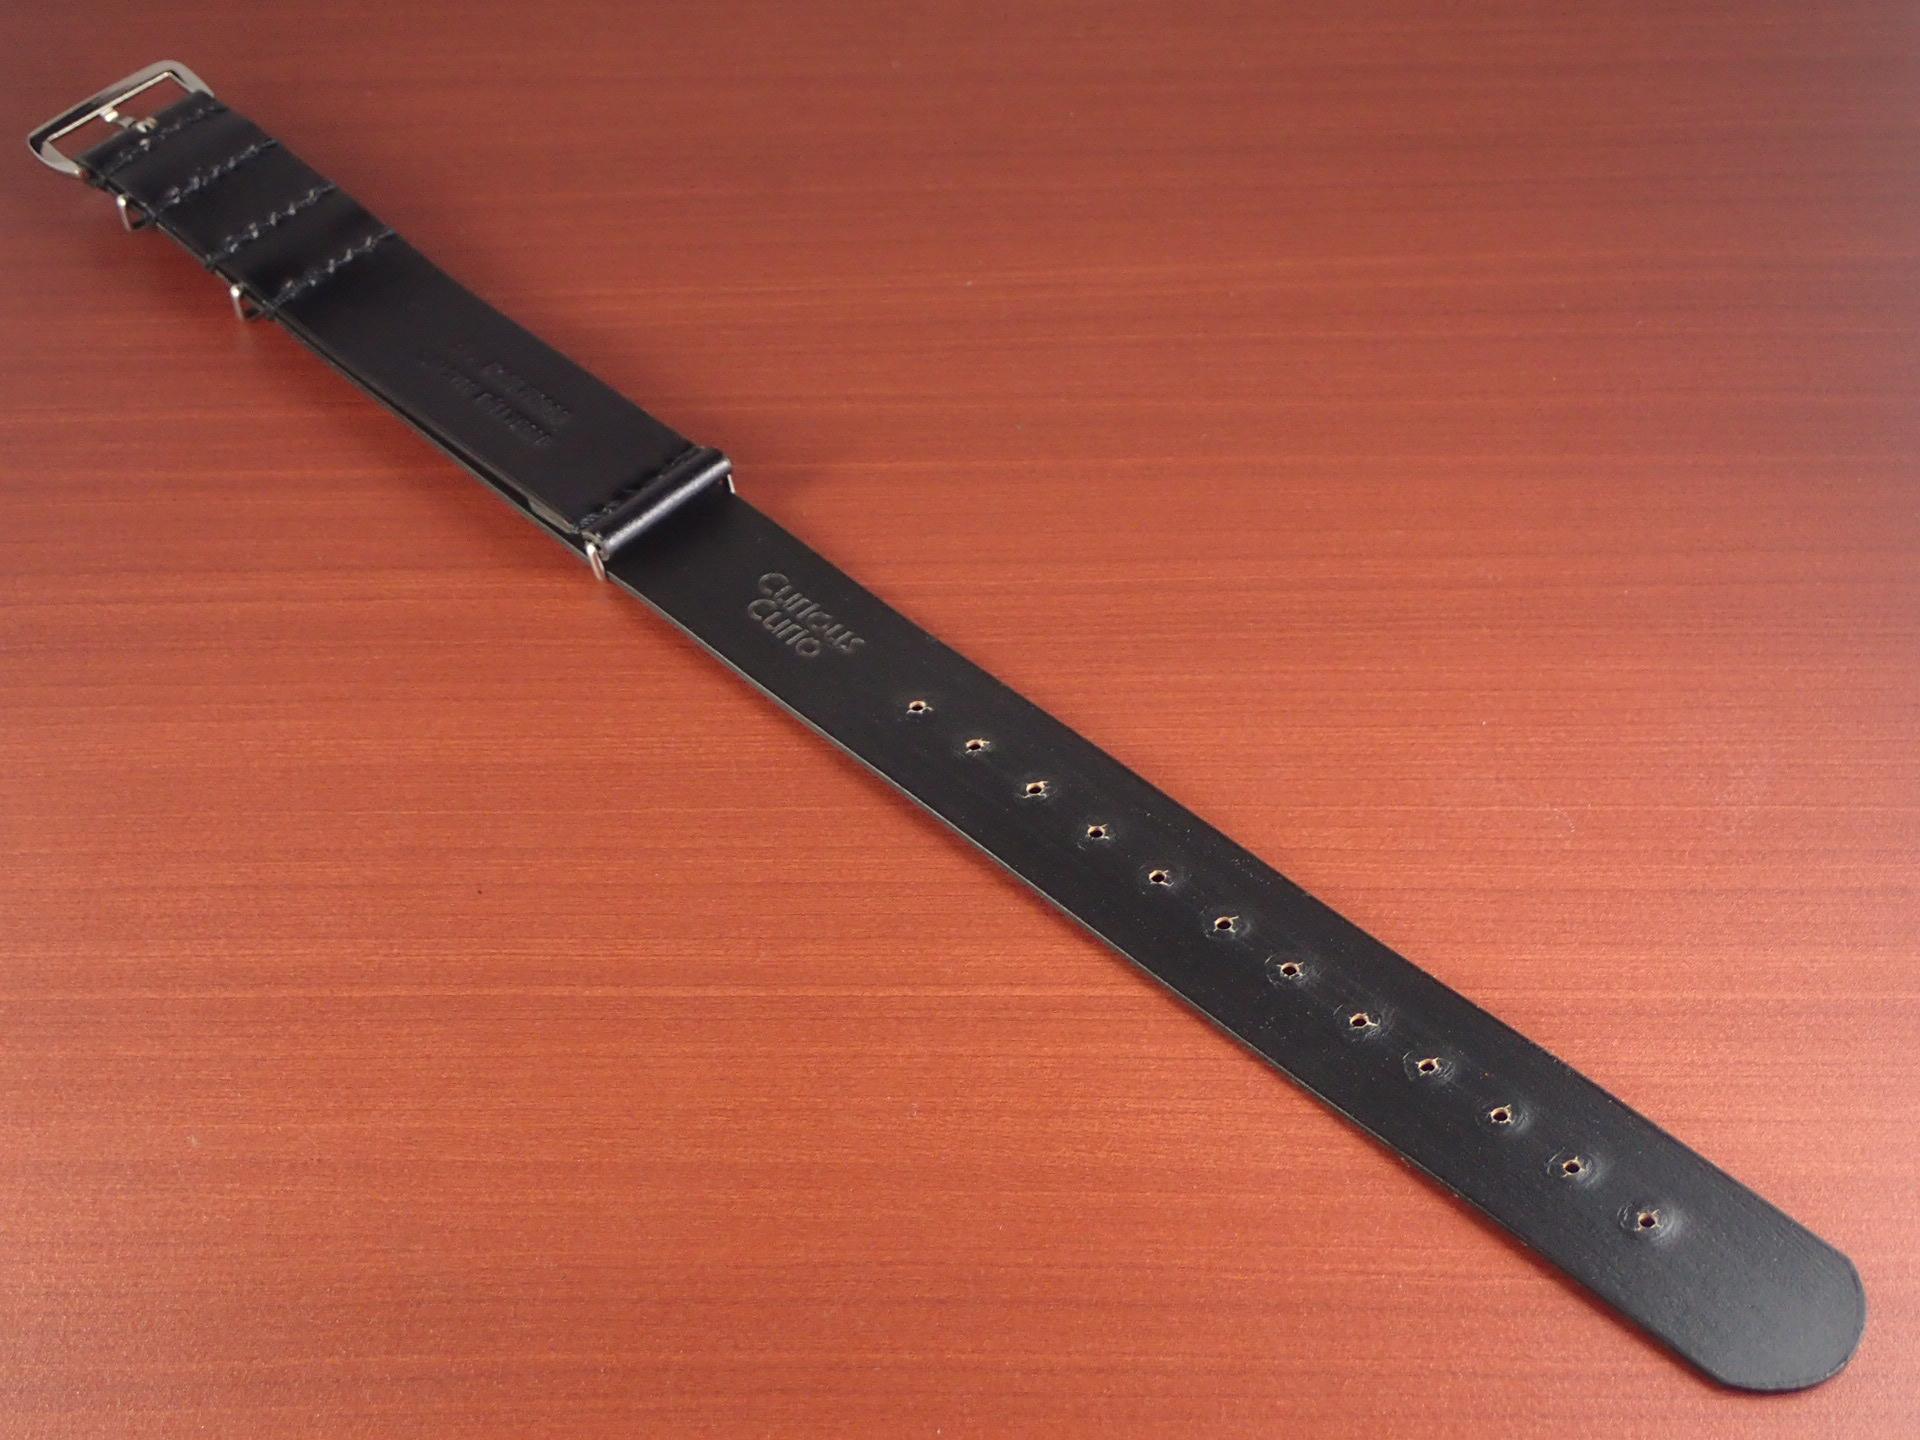 N.ハリウッド×キュリオスキュリオ コラボNATOコードバン革ベルト  ブラックの写真2枚目